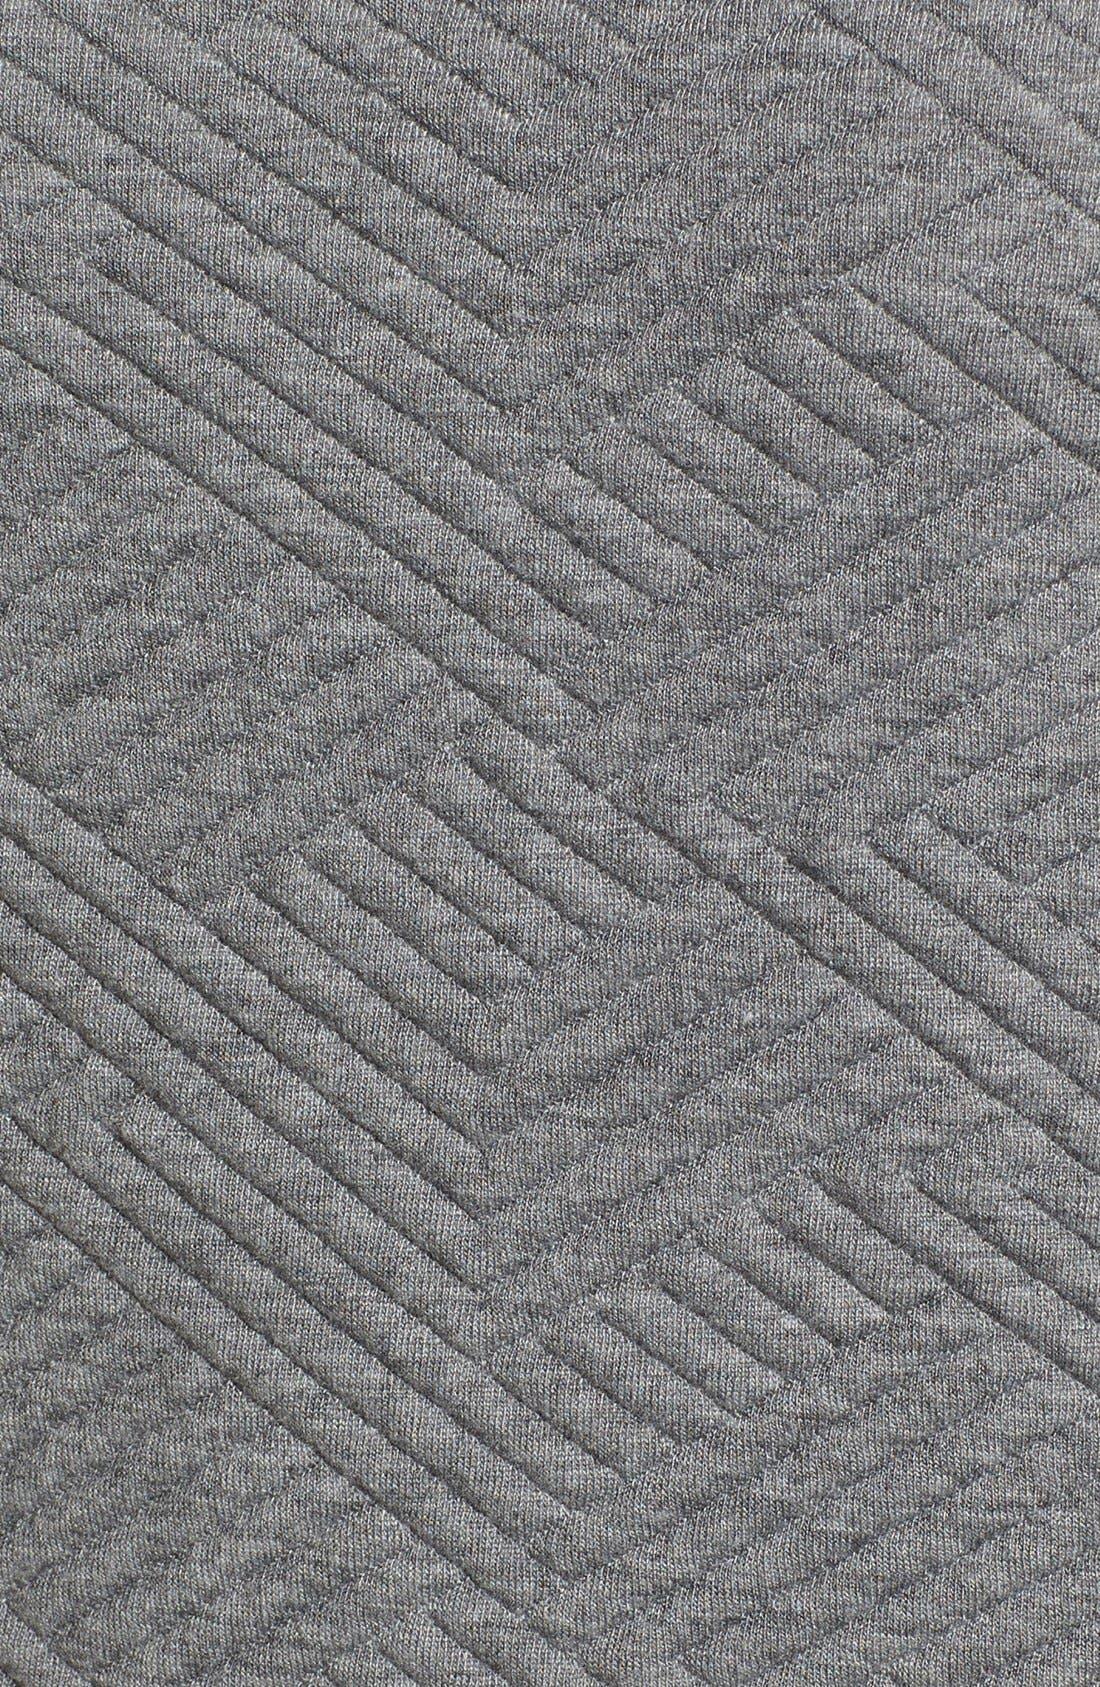 Textured Elbow Sleeve Tunic Dress,                             Alternate thumbnail 11, color,                             030